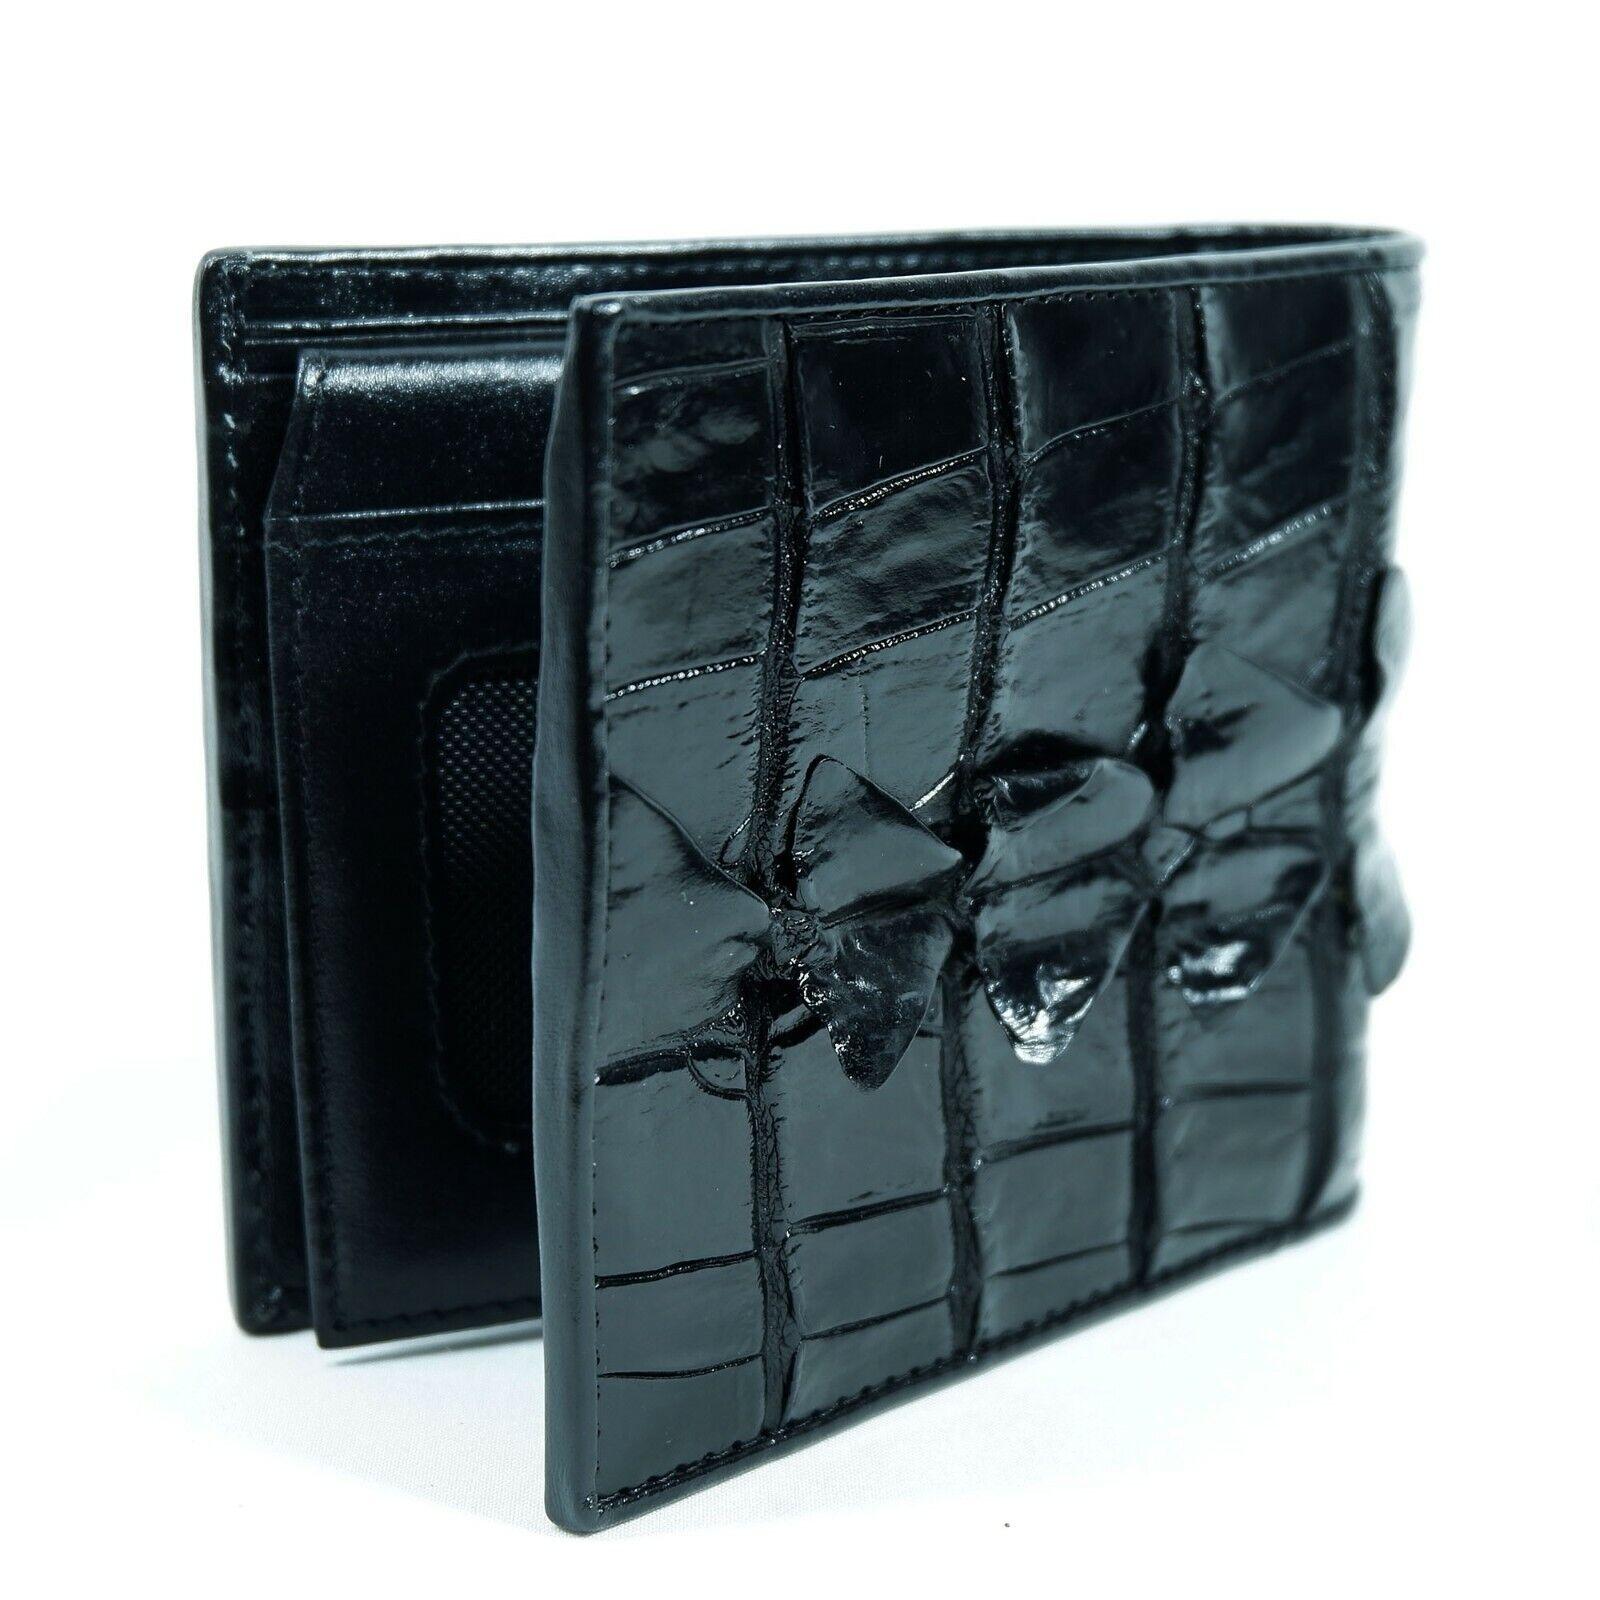 New Black High Gloss Crocodile Mens Bi-fold Zipper Coin Wallet Free shipping.